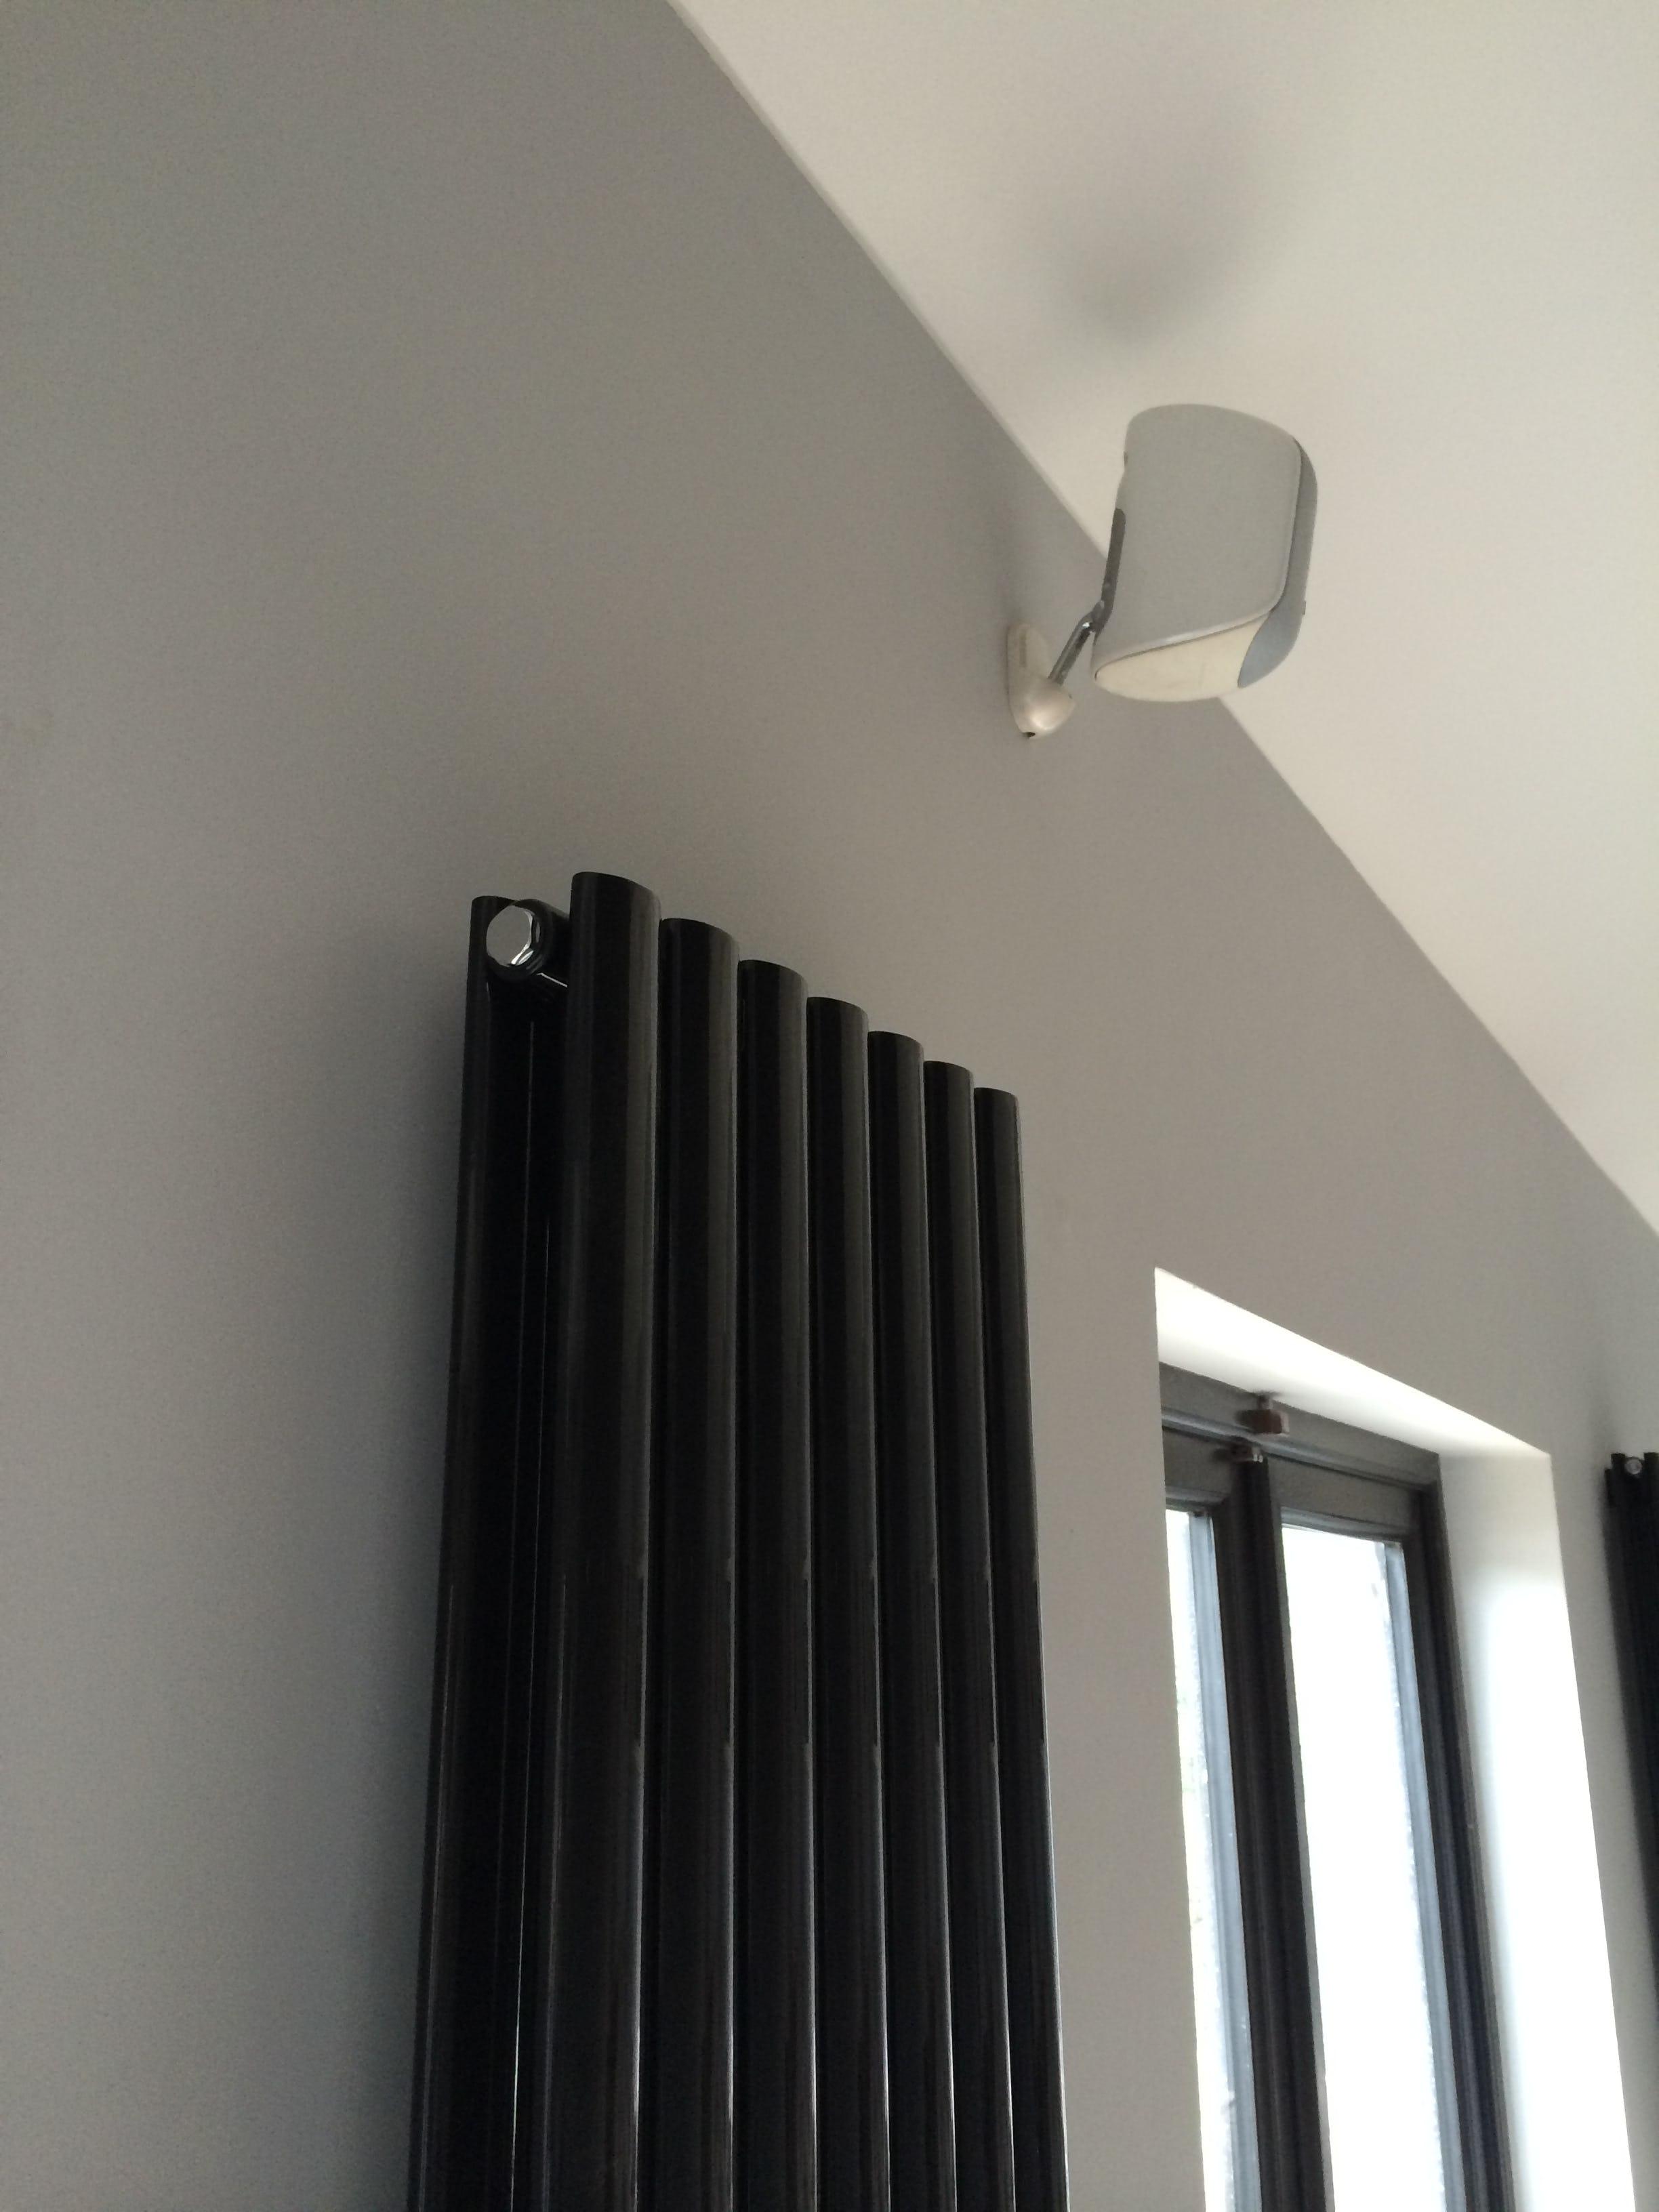 Rad speaker